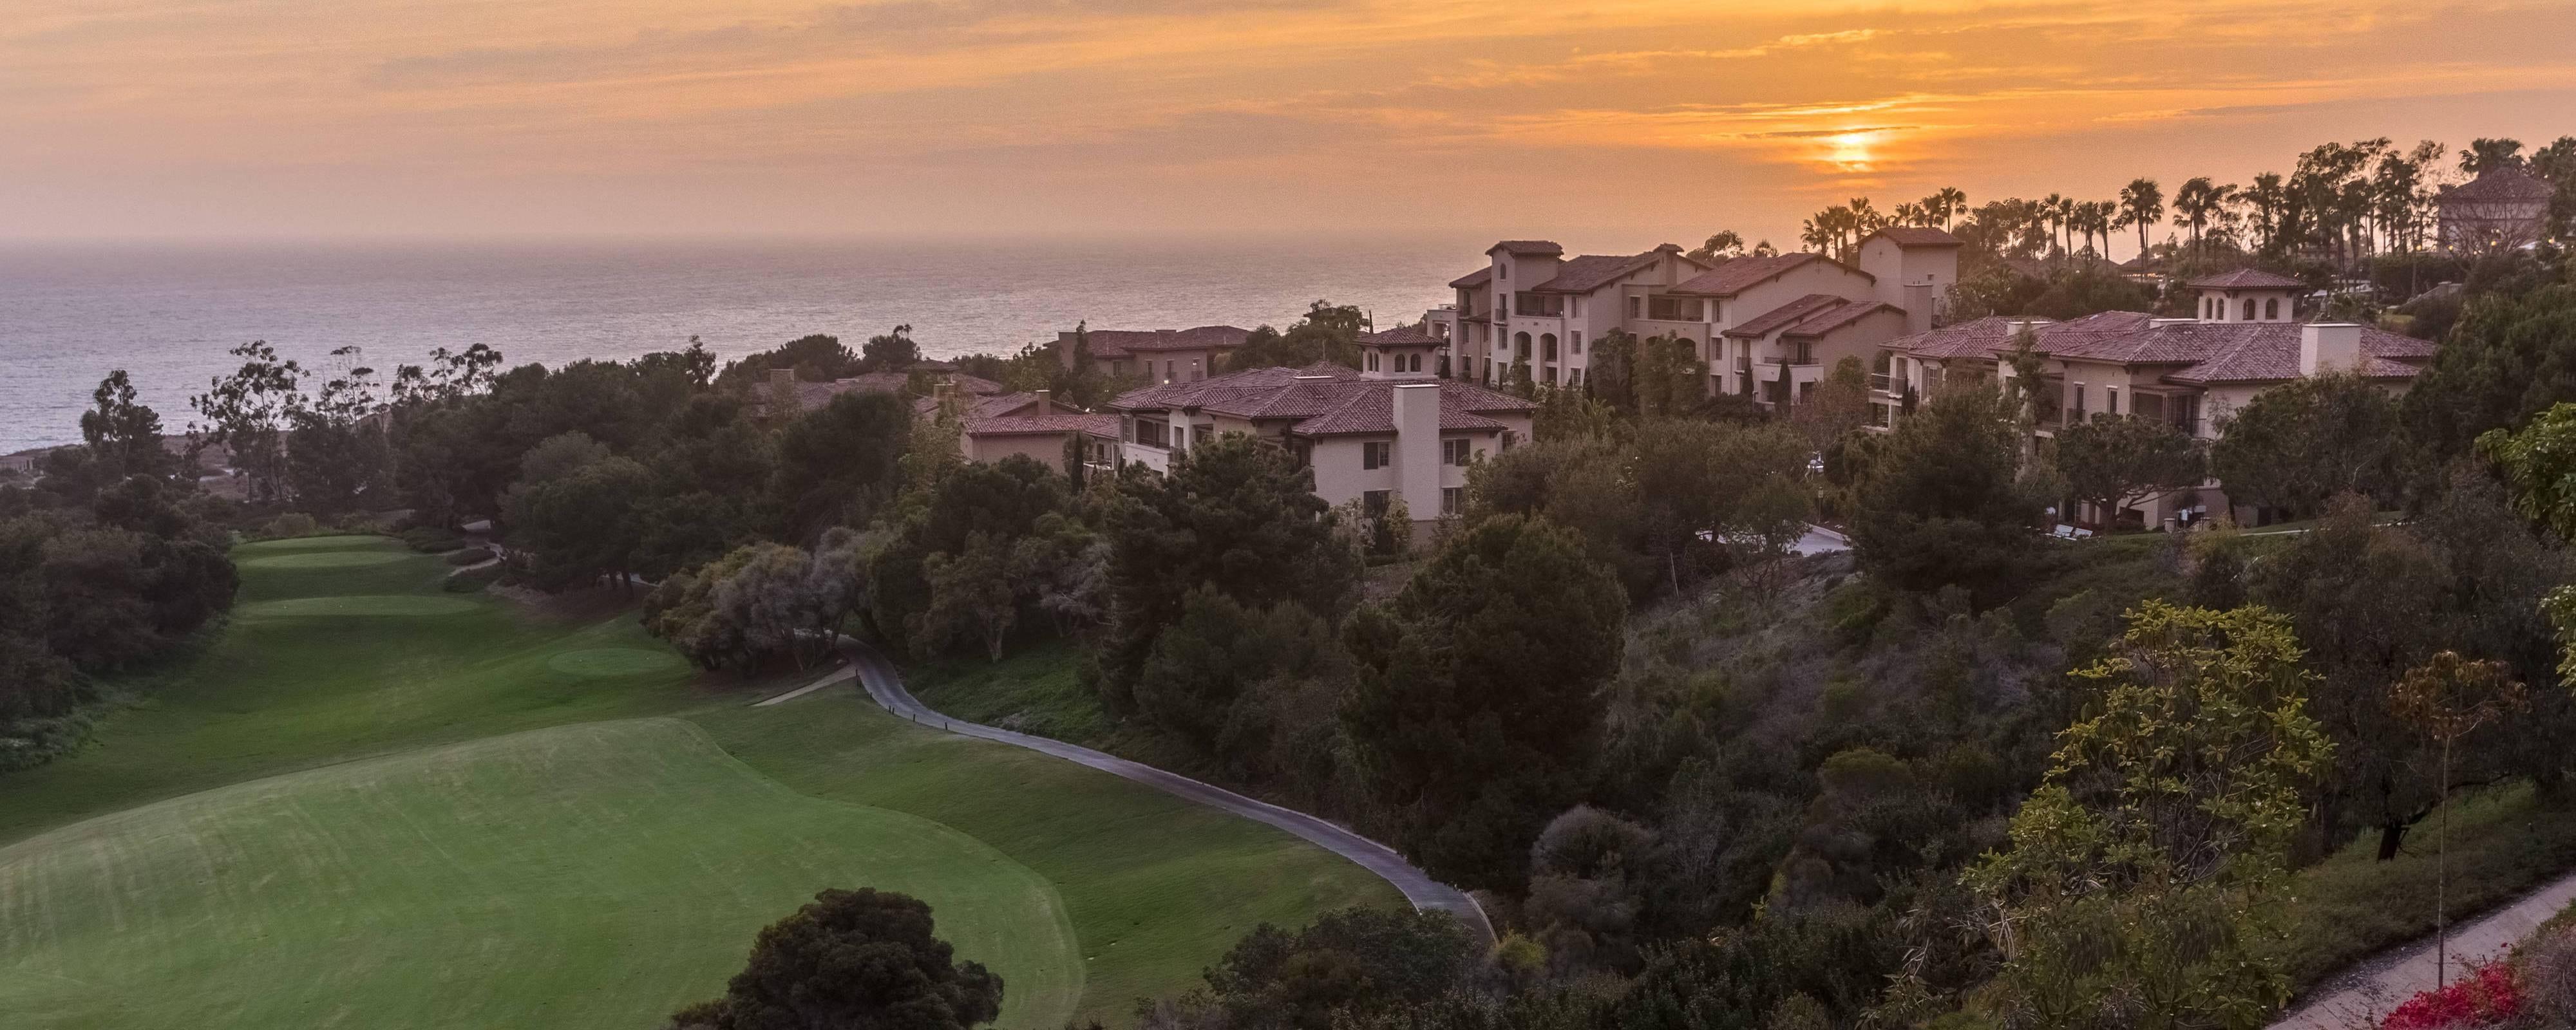 Newport Coast Beach Resort Timeshare Villas Rental